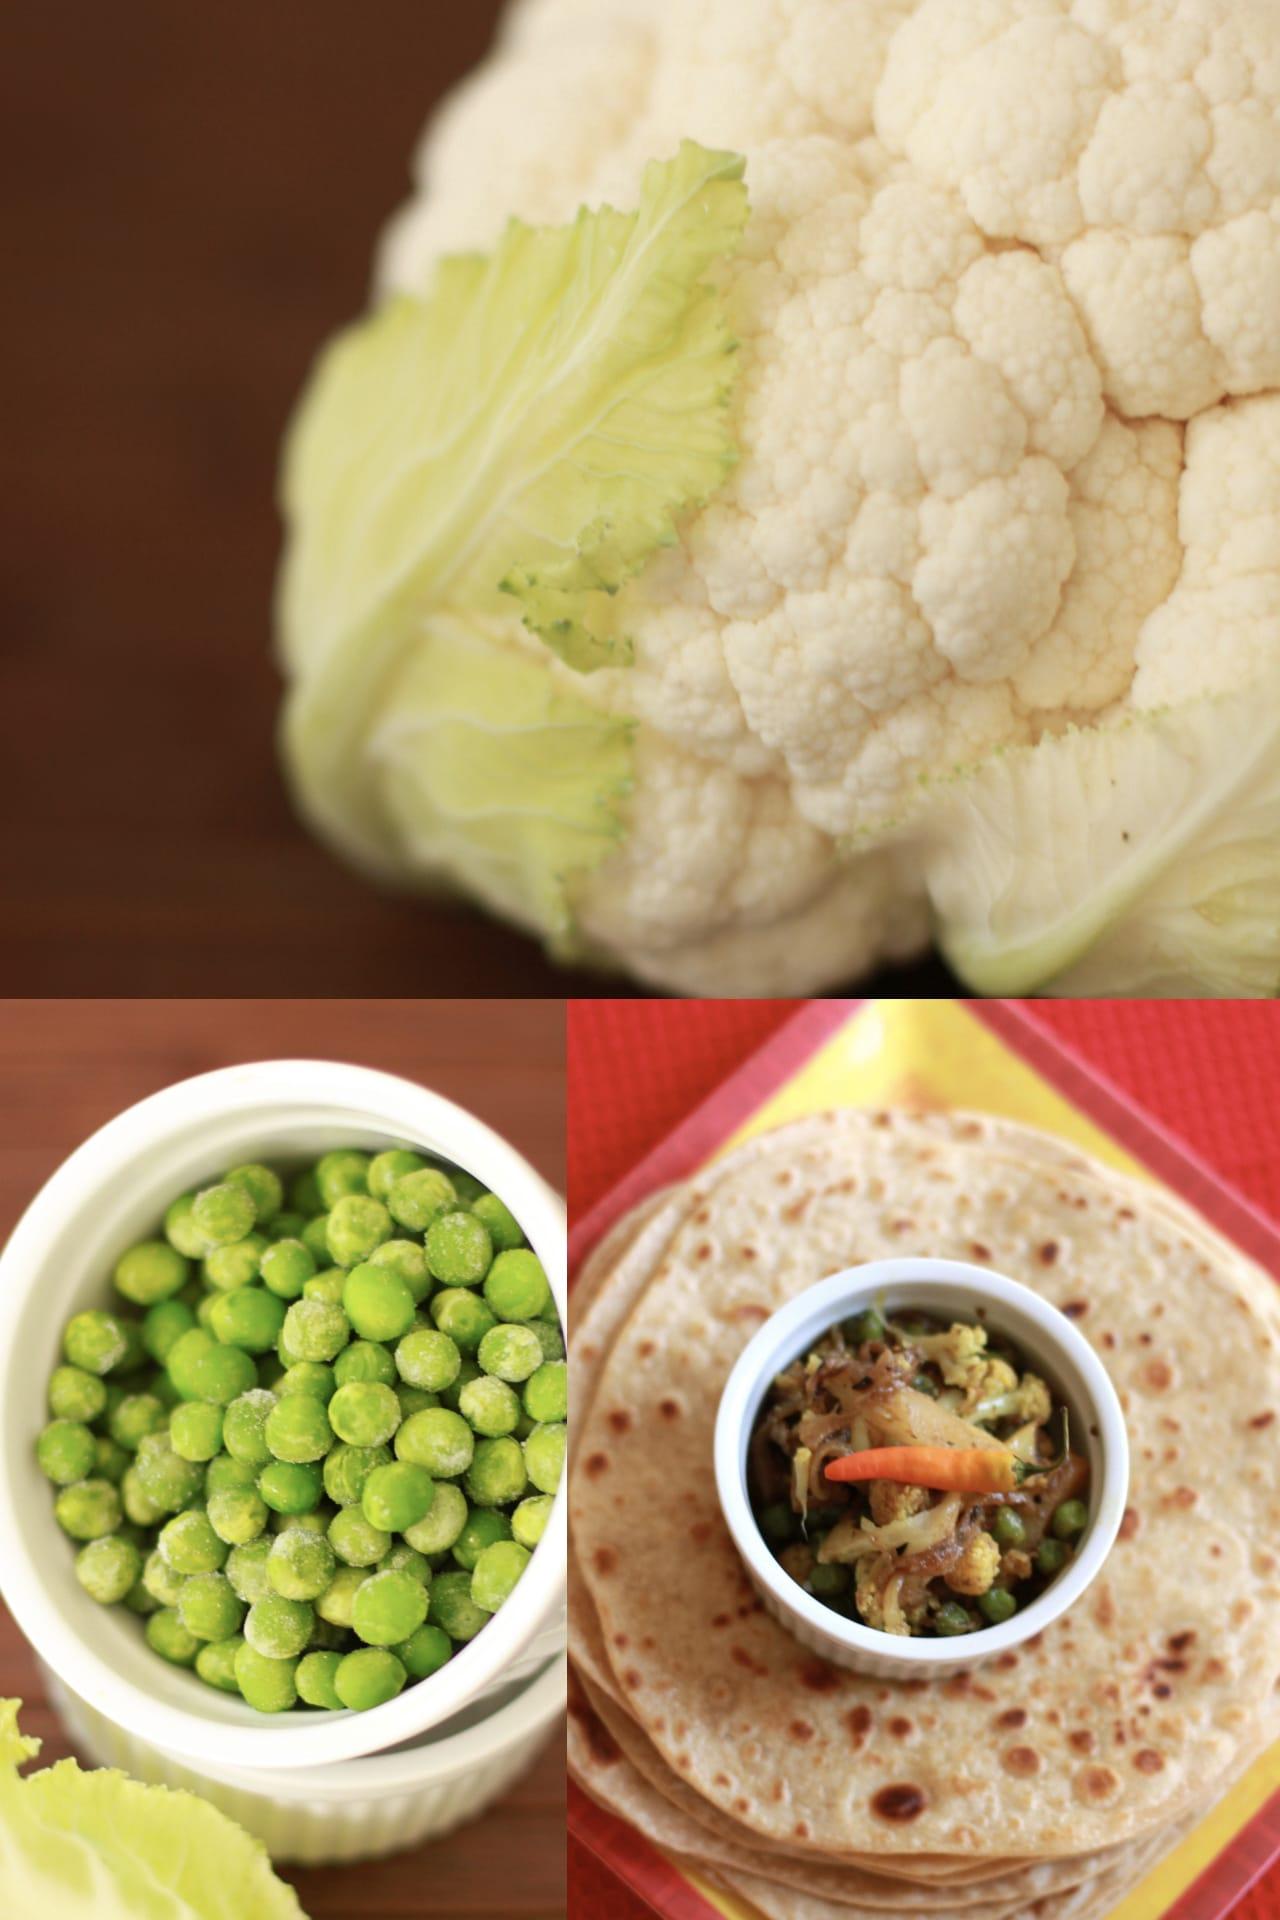 Gobi Matar/Cauliflower cooked with Peas 1